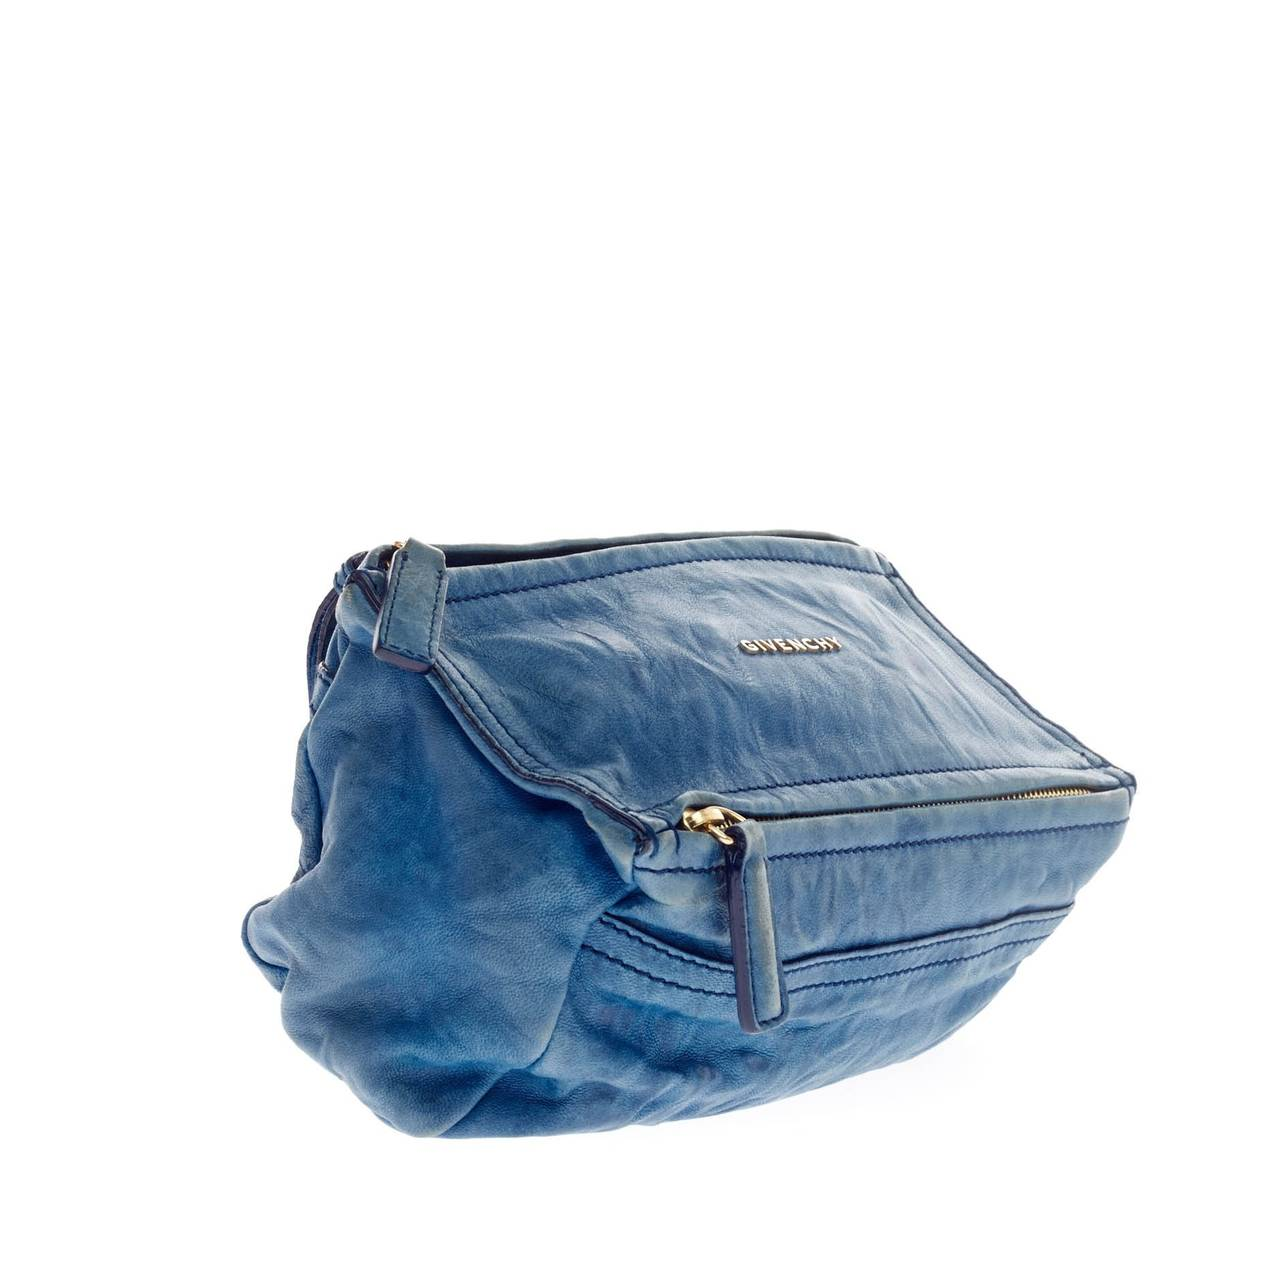 Givenchy Pandora Bag Leather Mini 3